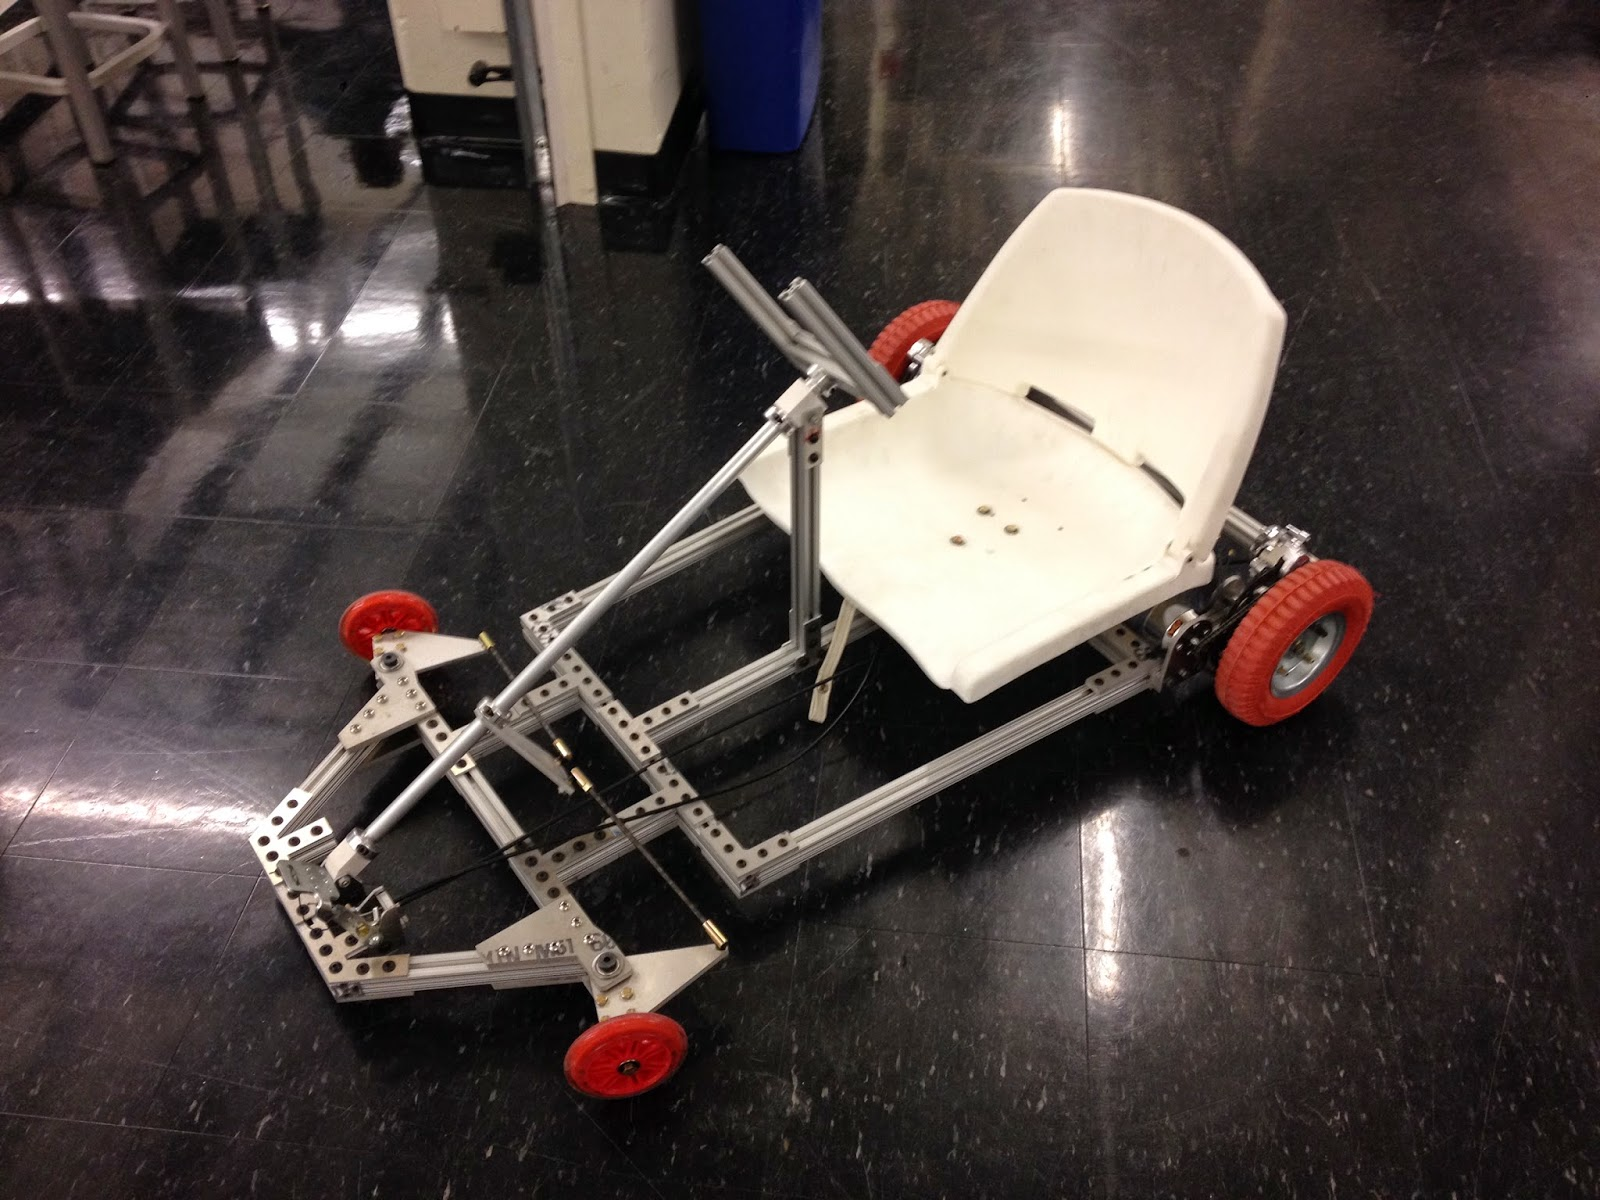 Building An Electric Go-Kart: Rolling Frame